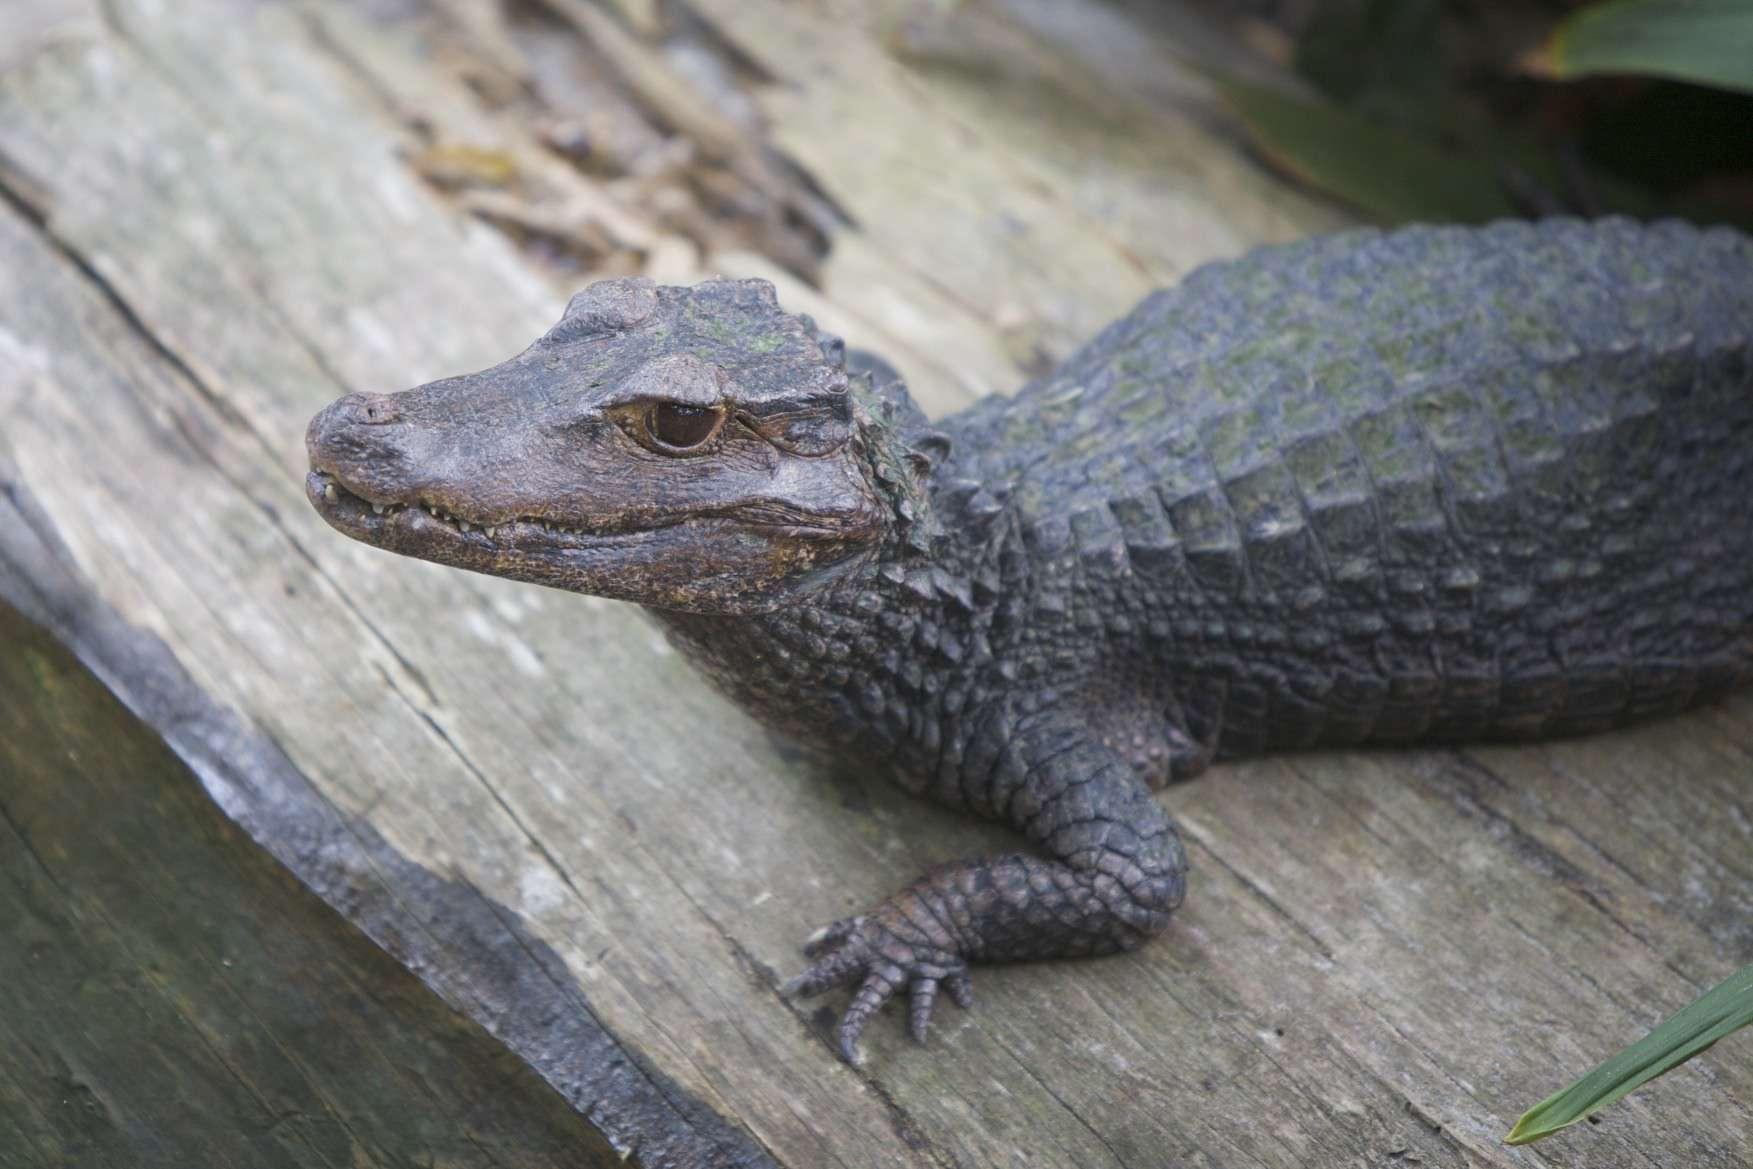 Dwarf crocodile with its head upright on a wooden board